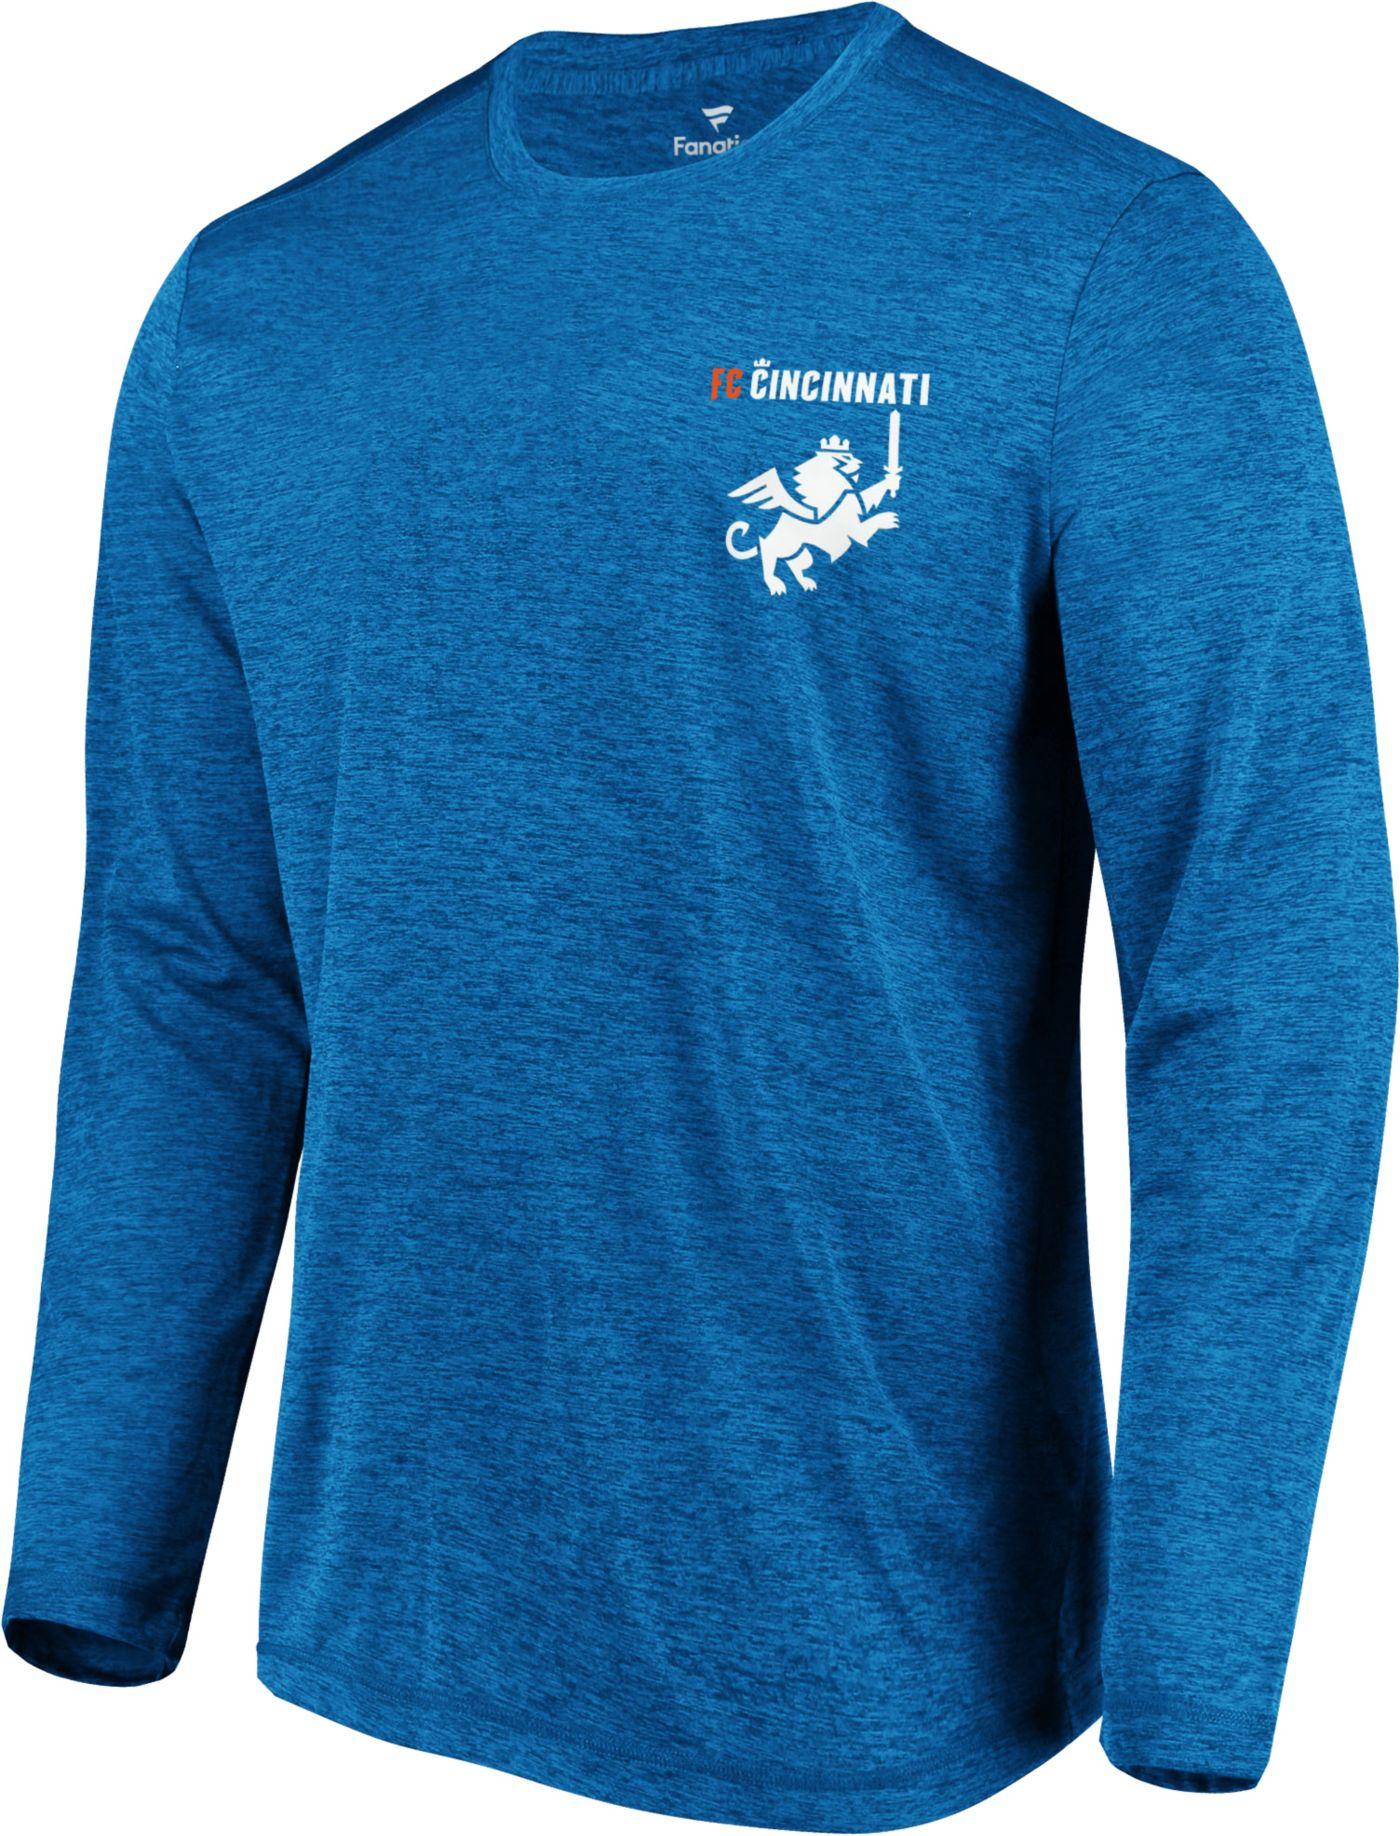 MLS Men's FC Cincinnati Wordmark Crest Blue Heathered Long Sleeve Shirt